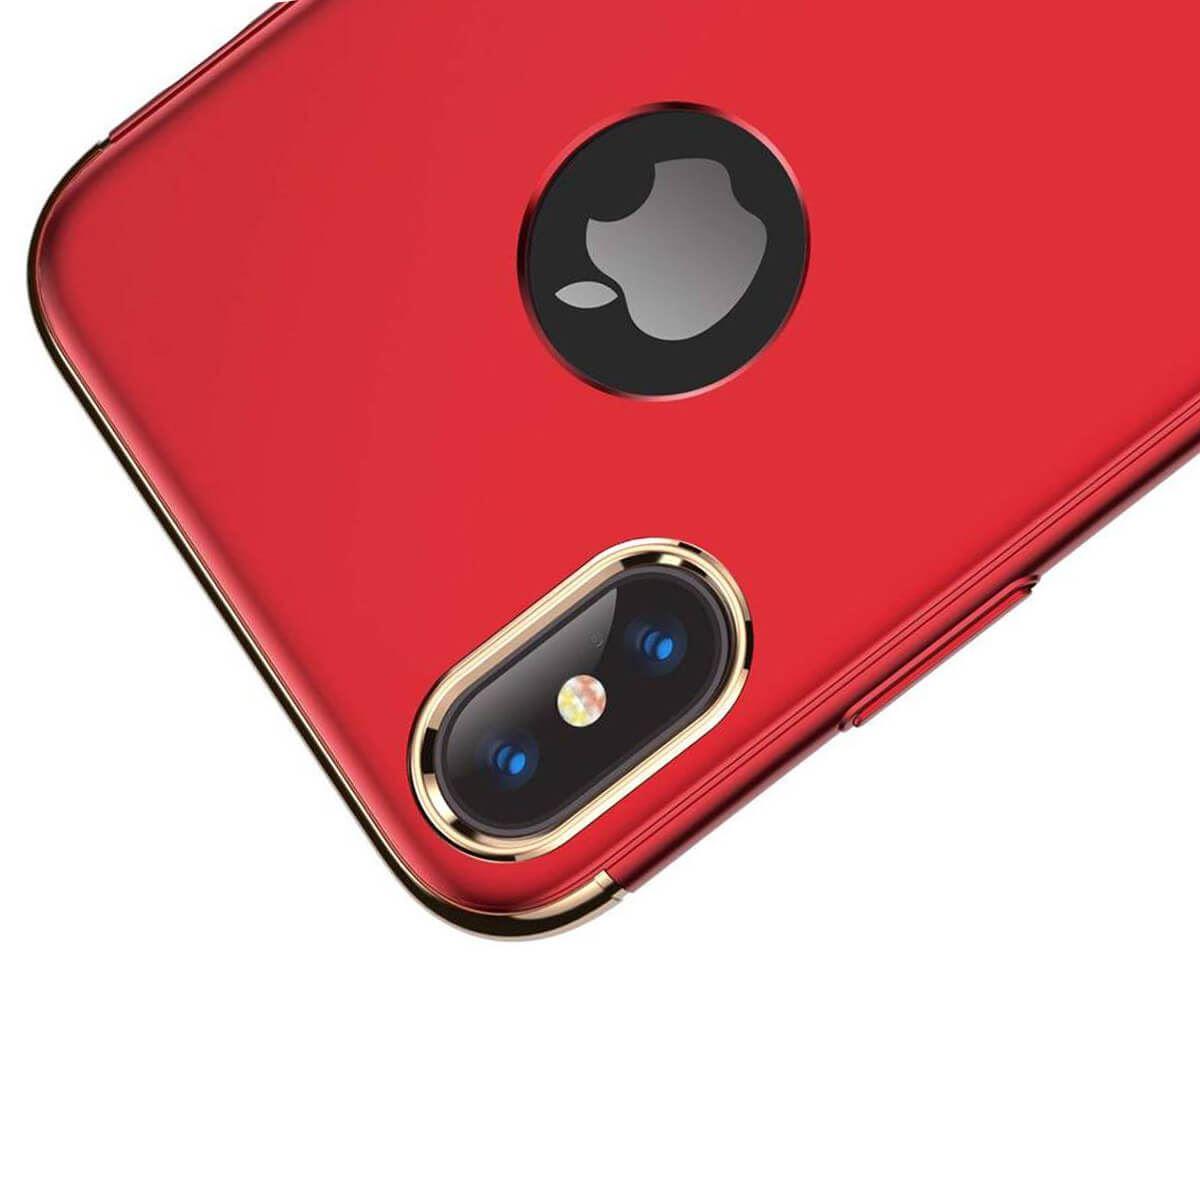 ShockProof-Thin-Case-For-Apple-iPhone-5-Se-7-6s-Plus-360-Hybrid-Matte-Slim-Cover thumbnail 6